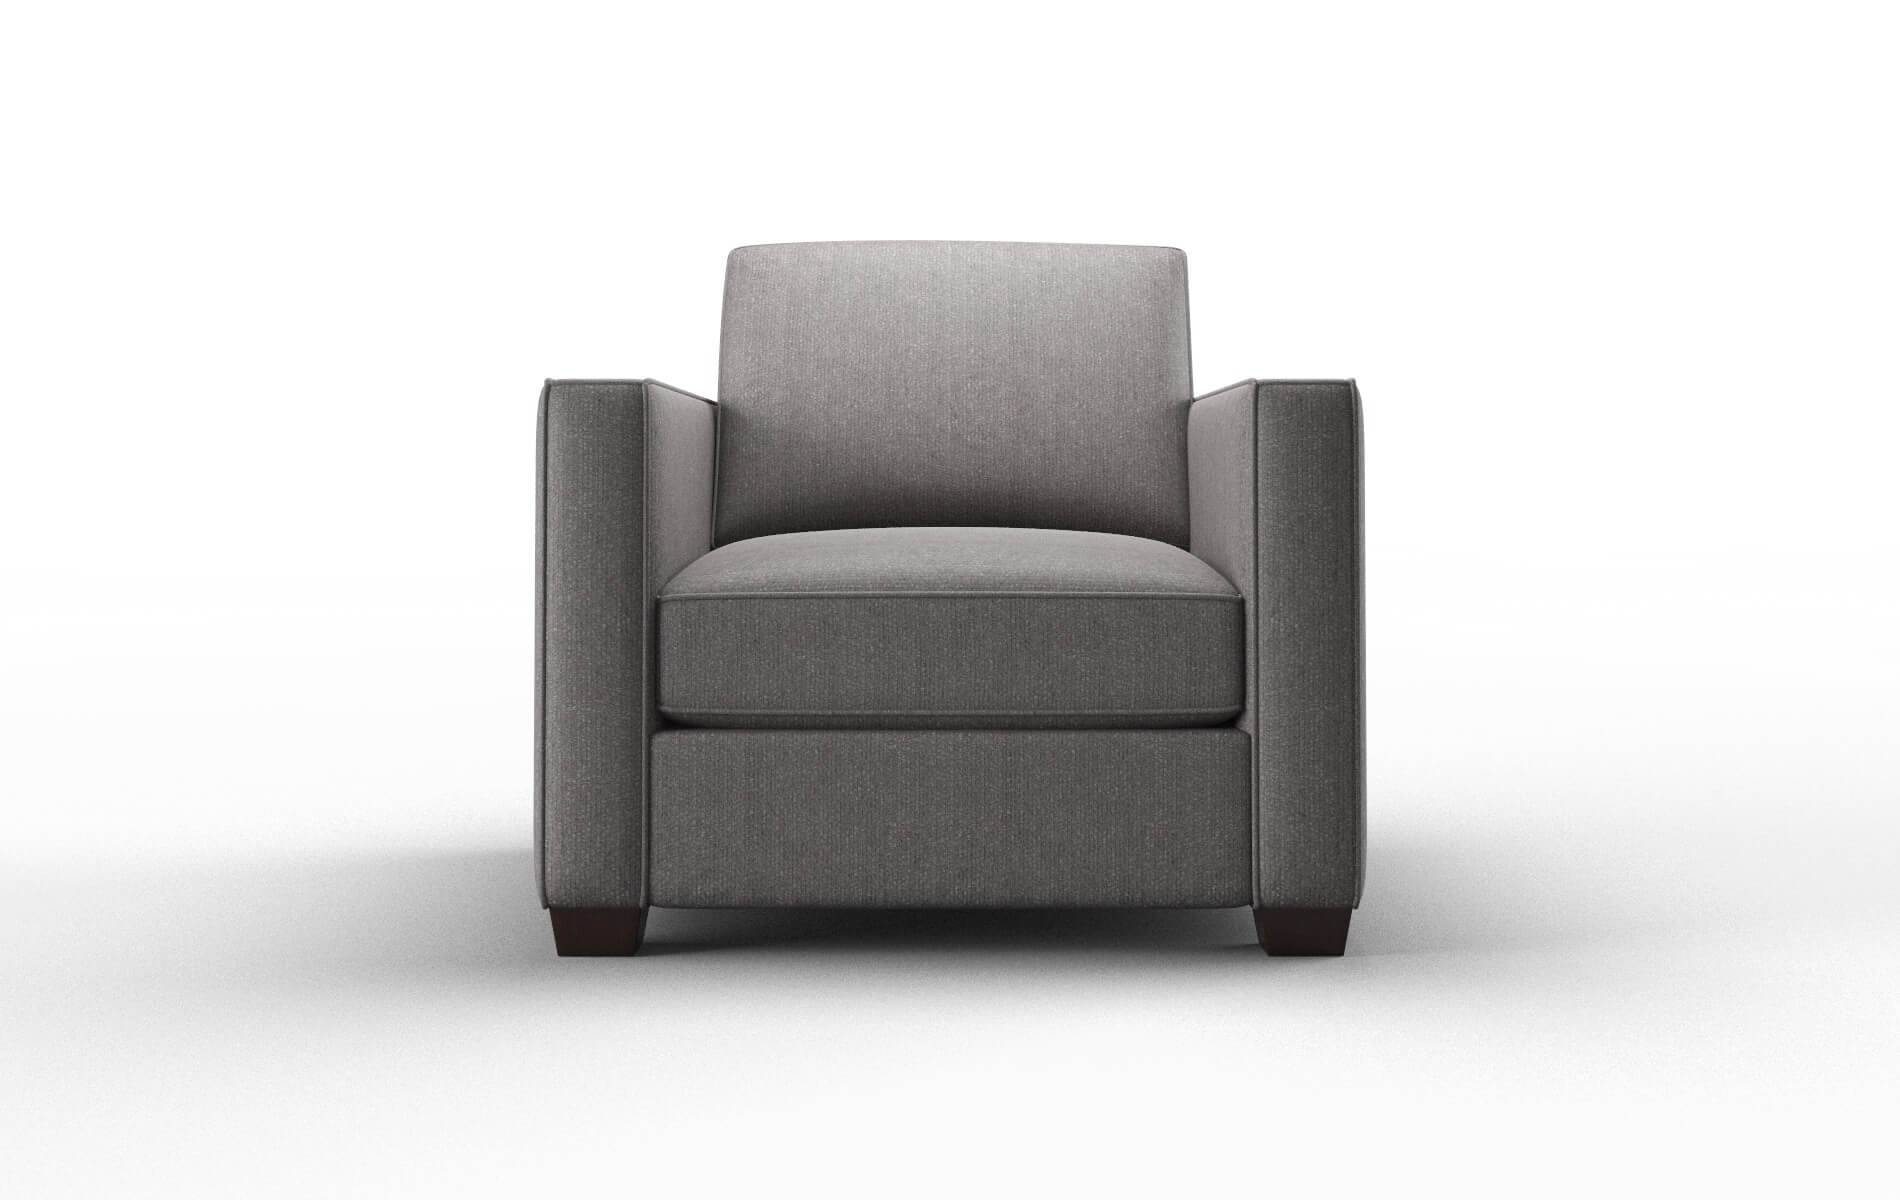 Calgary Sasha Granite chair espresso legs